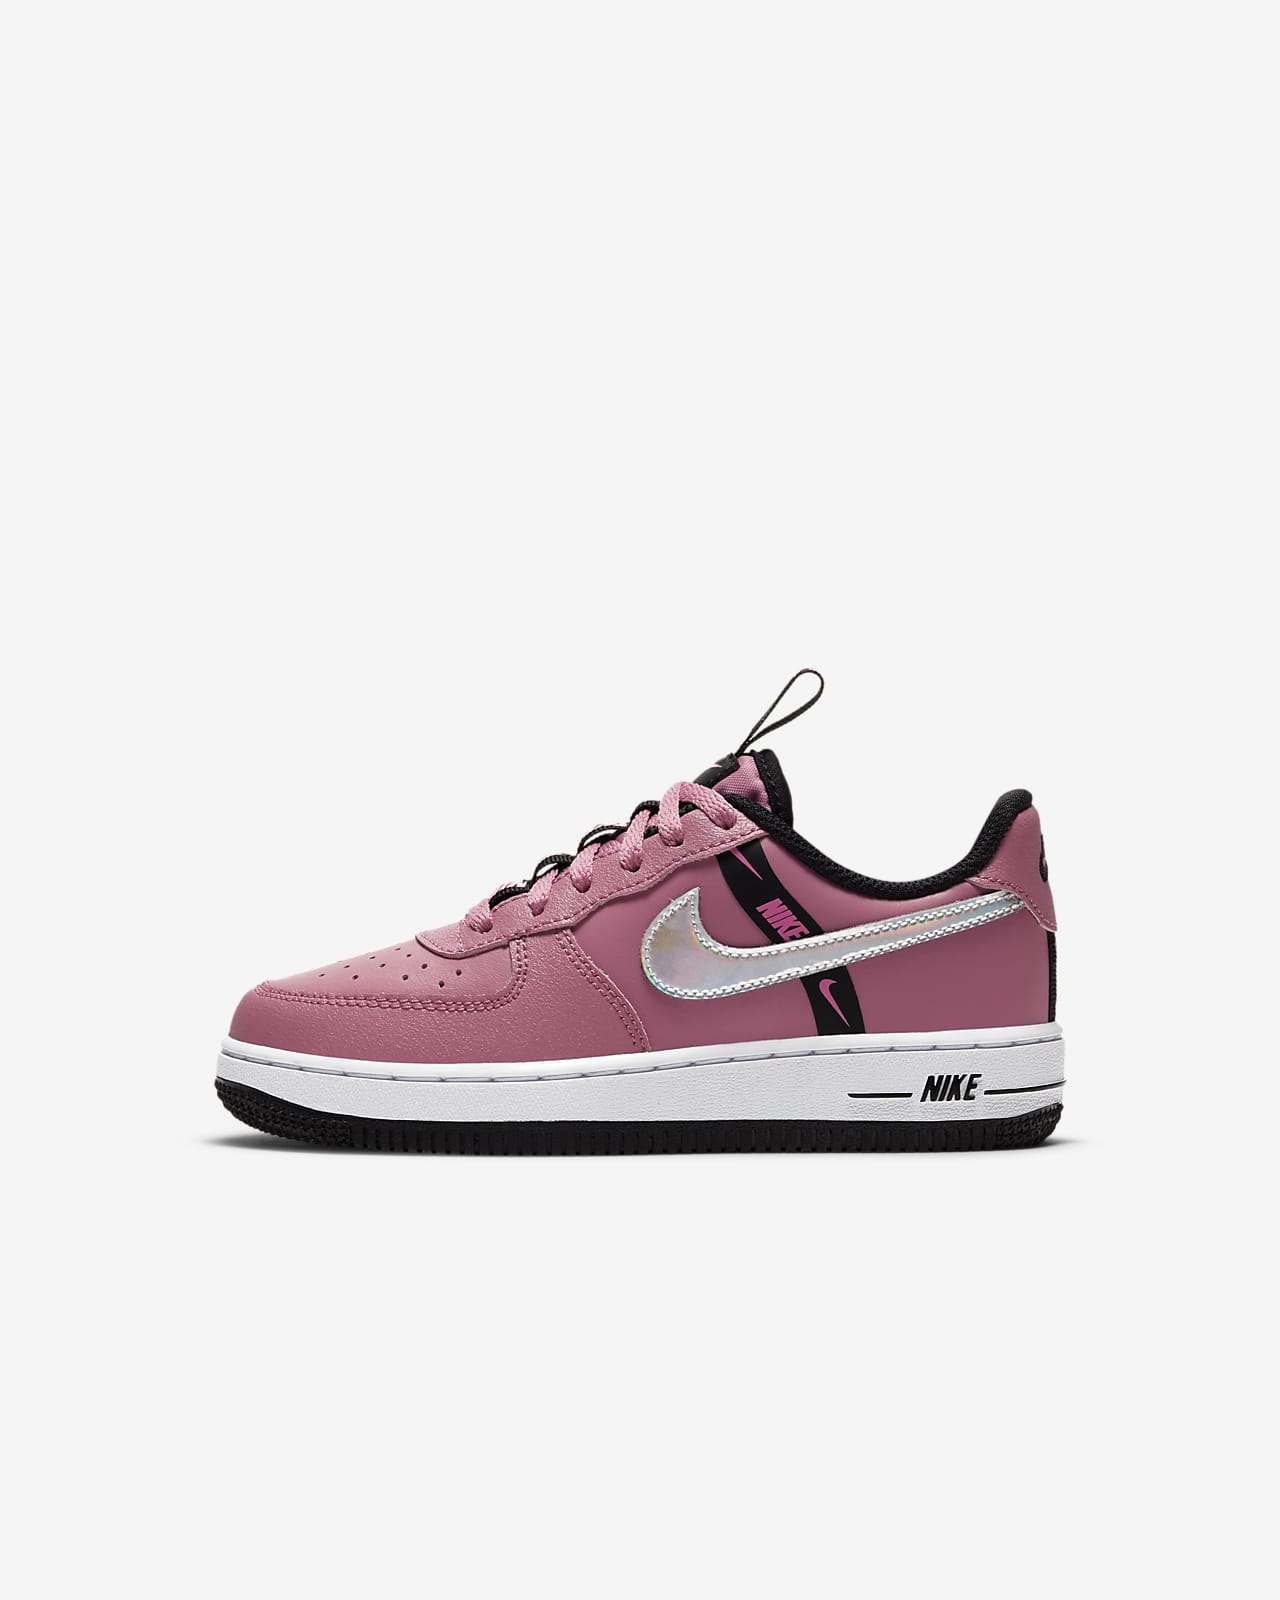 Nike Force 1 LV8 KSA Little Kids' Shoe